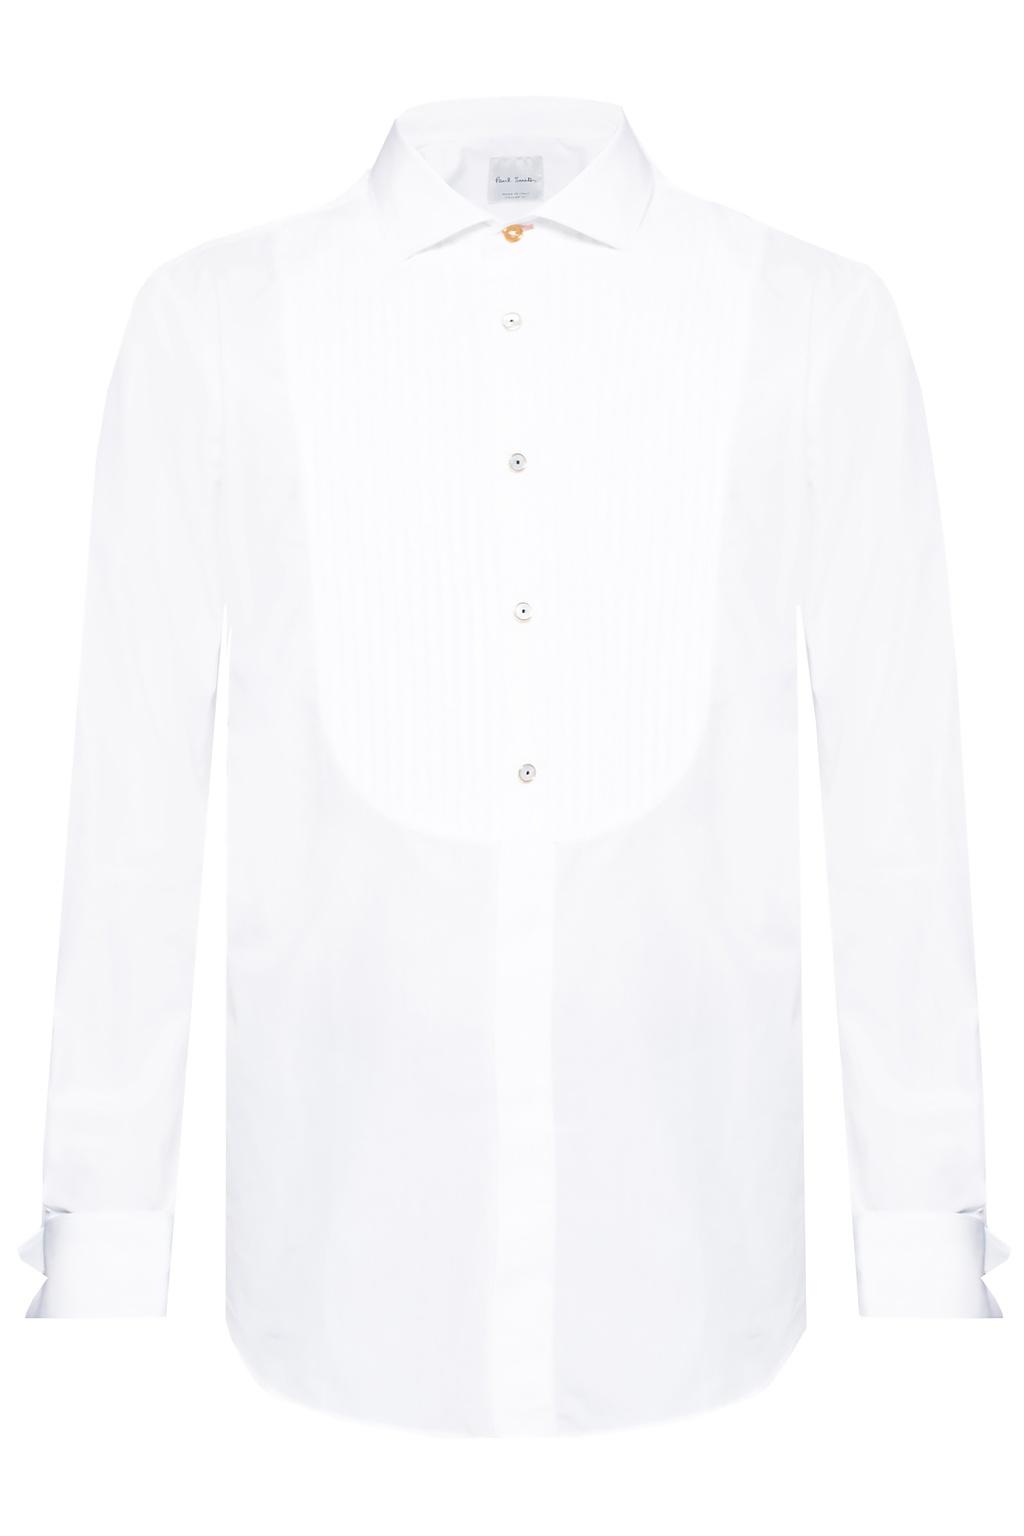 Paul Smith Tuxedo shirt